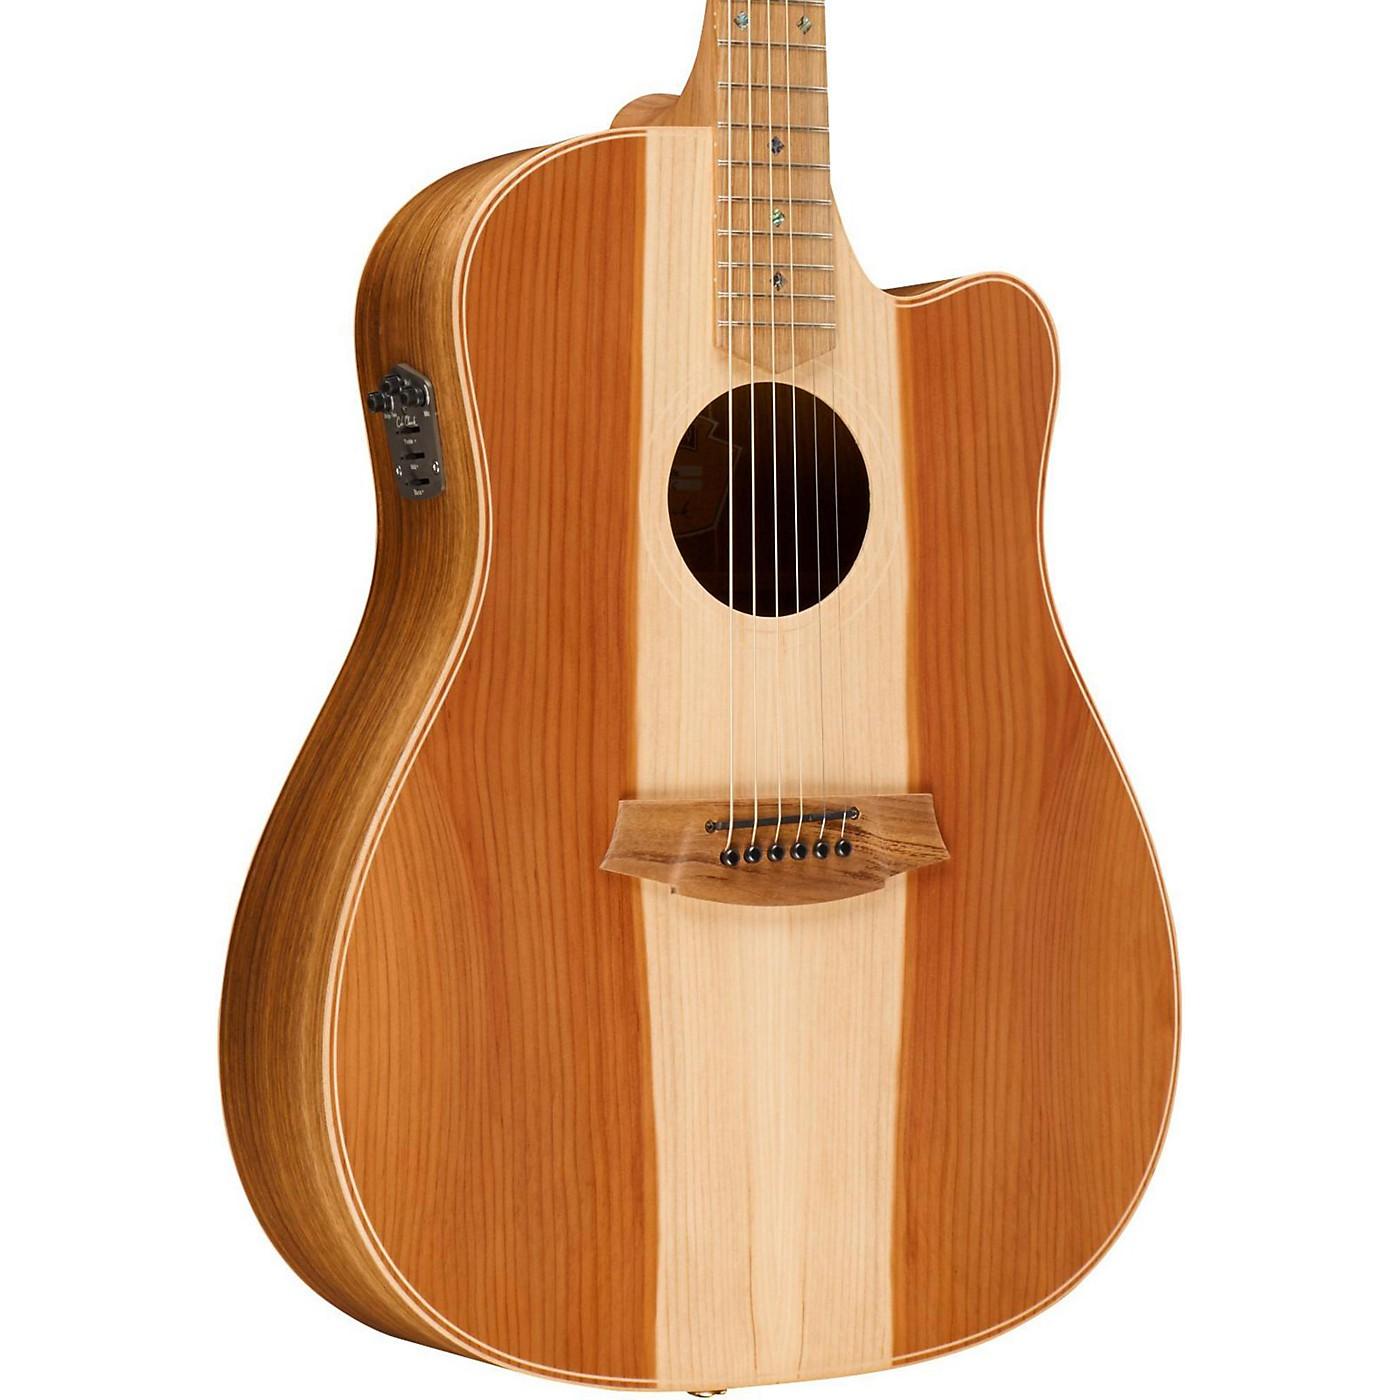 Cole Clark Fat Lady 2 Series Australian Eco Redwood/Blackwood Dreadnought Acoustic-Electric Guitar thumbnail